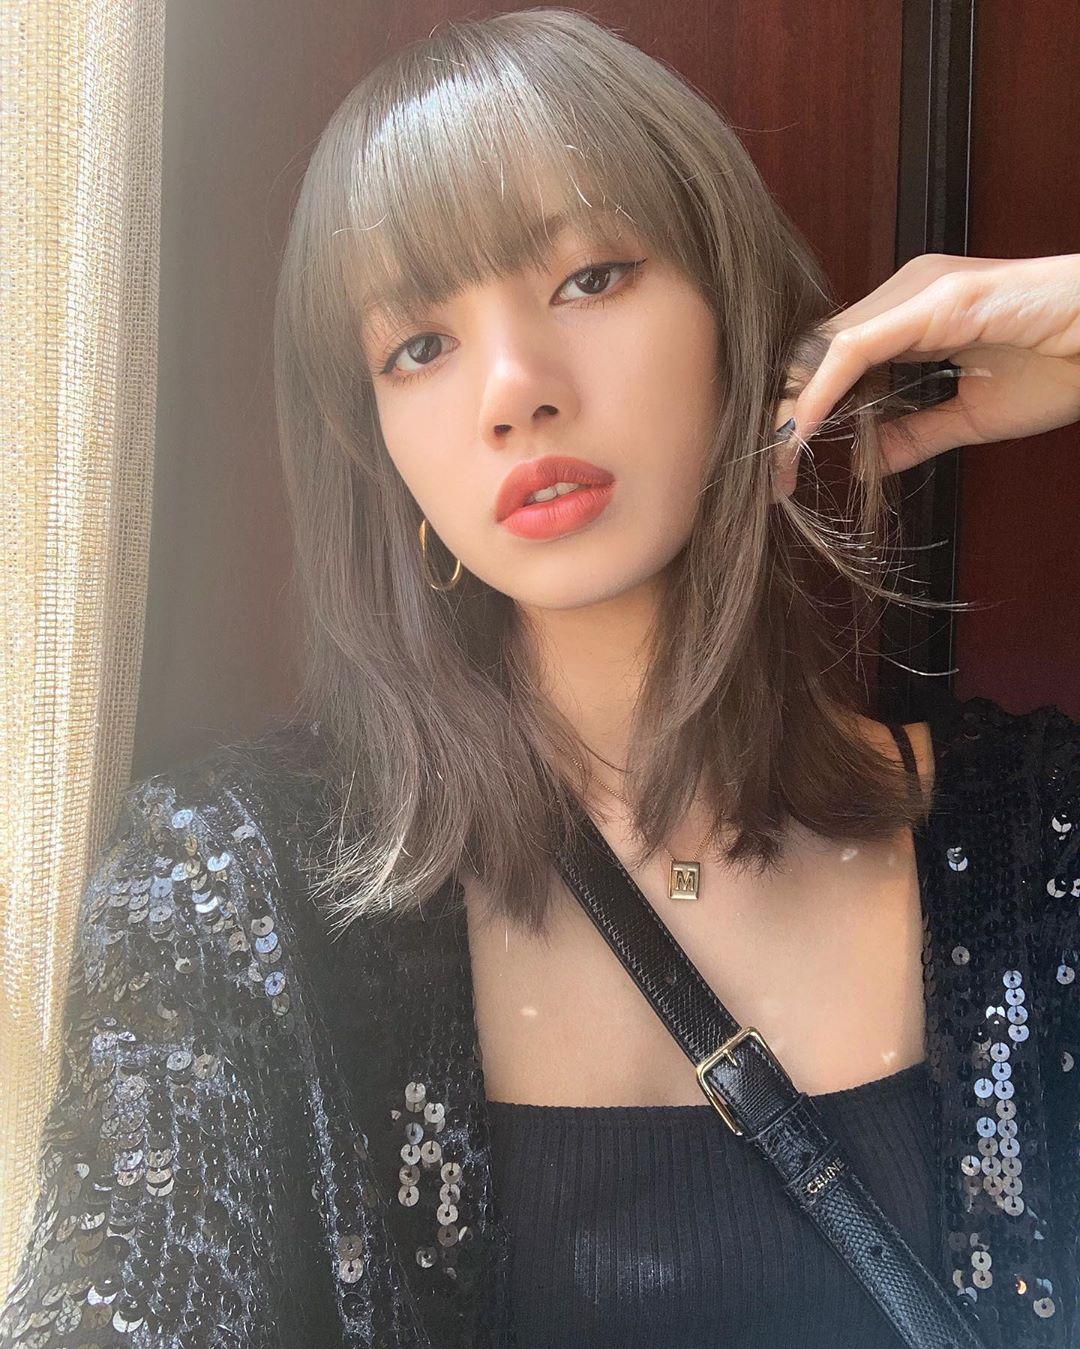 1-BLACKPINK-Lisa-Instagram-Update-4-July-2019